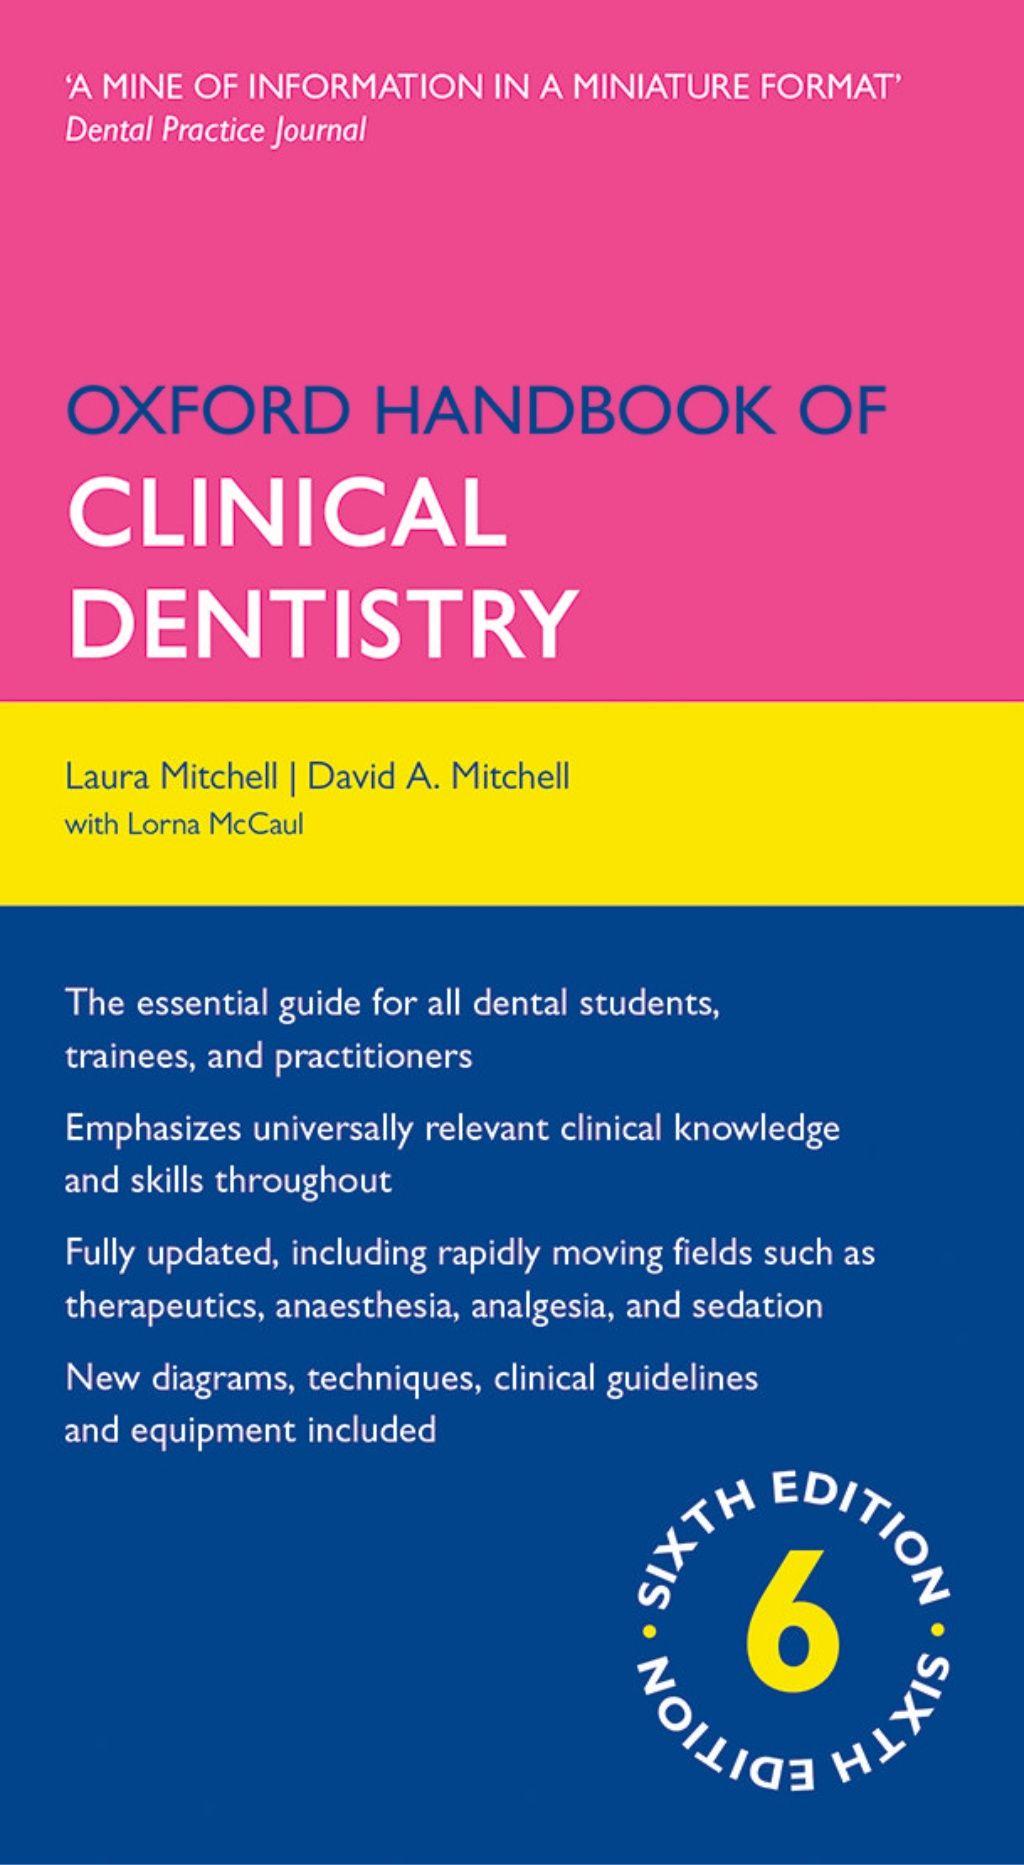 Oxford Handbook Of Clinical Dentistry 6 E 2014 Dentistry Student Dentistry Dental Student